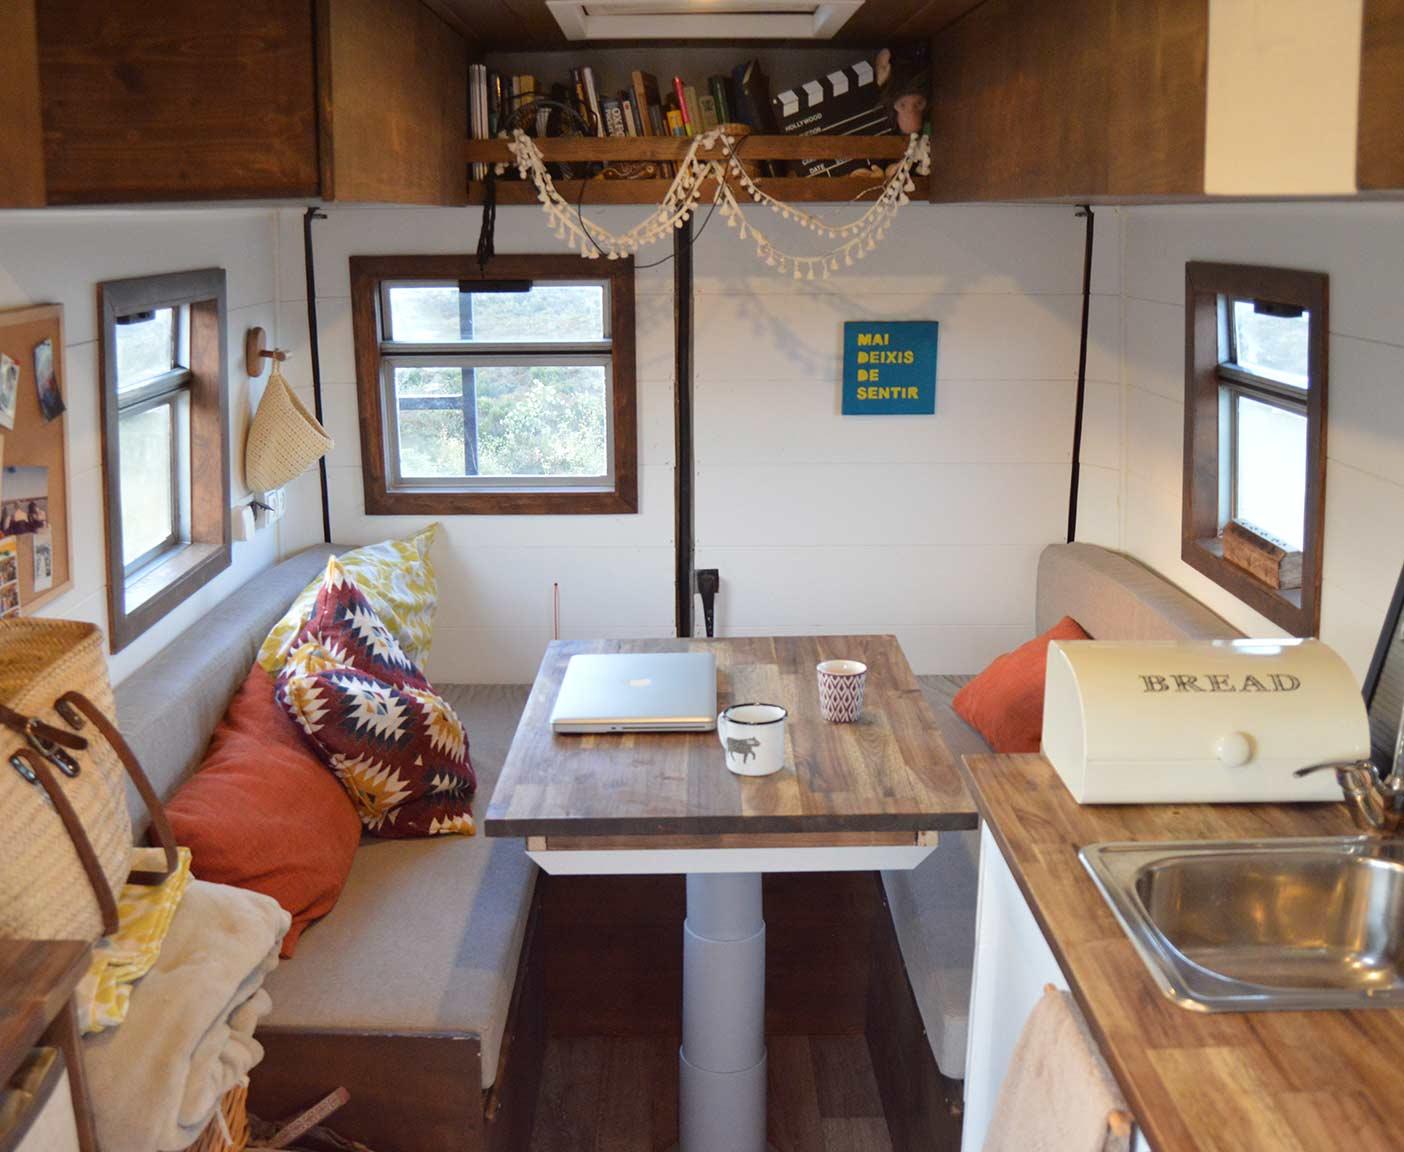 Mercedes-Benz-609D-wohnmobil-camper-bundeswehr-ambulance-interior-living